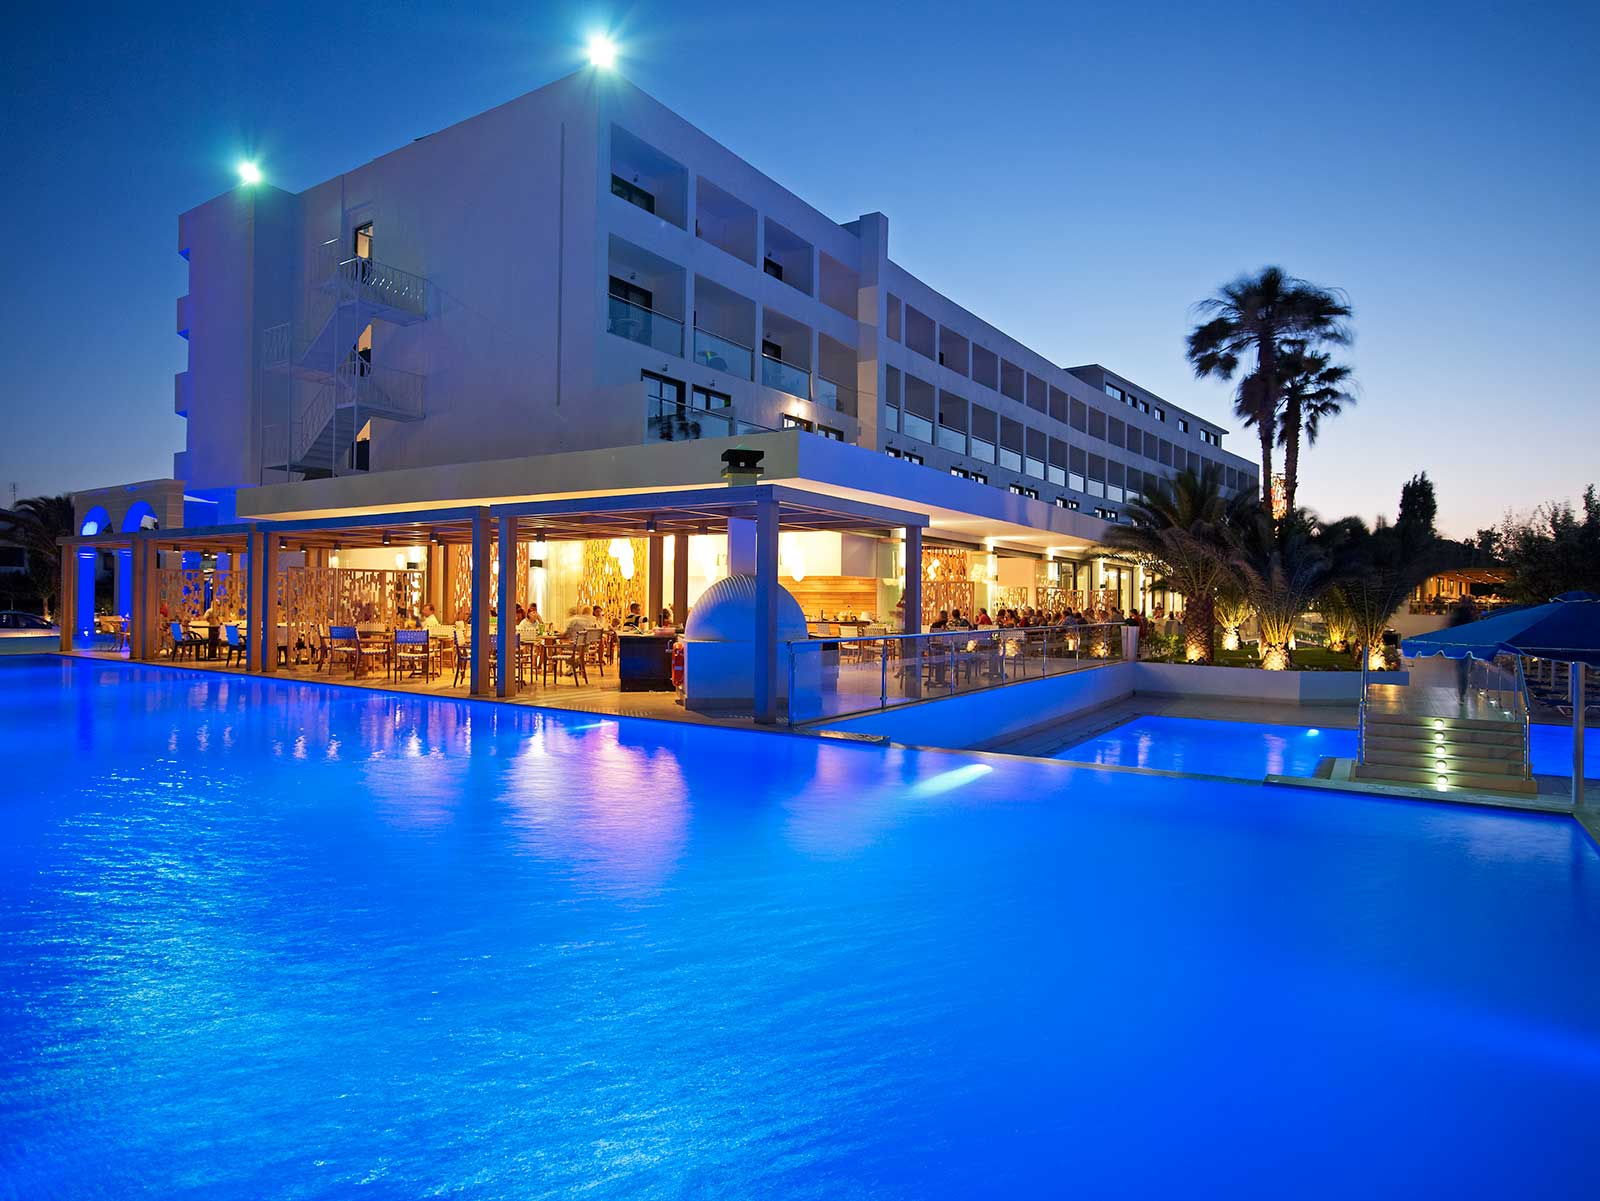 митсис фото отеля